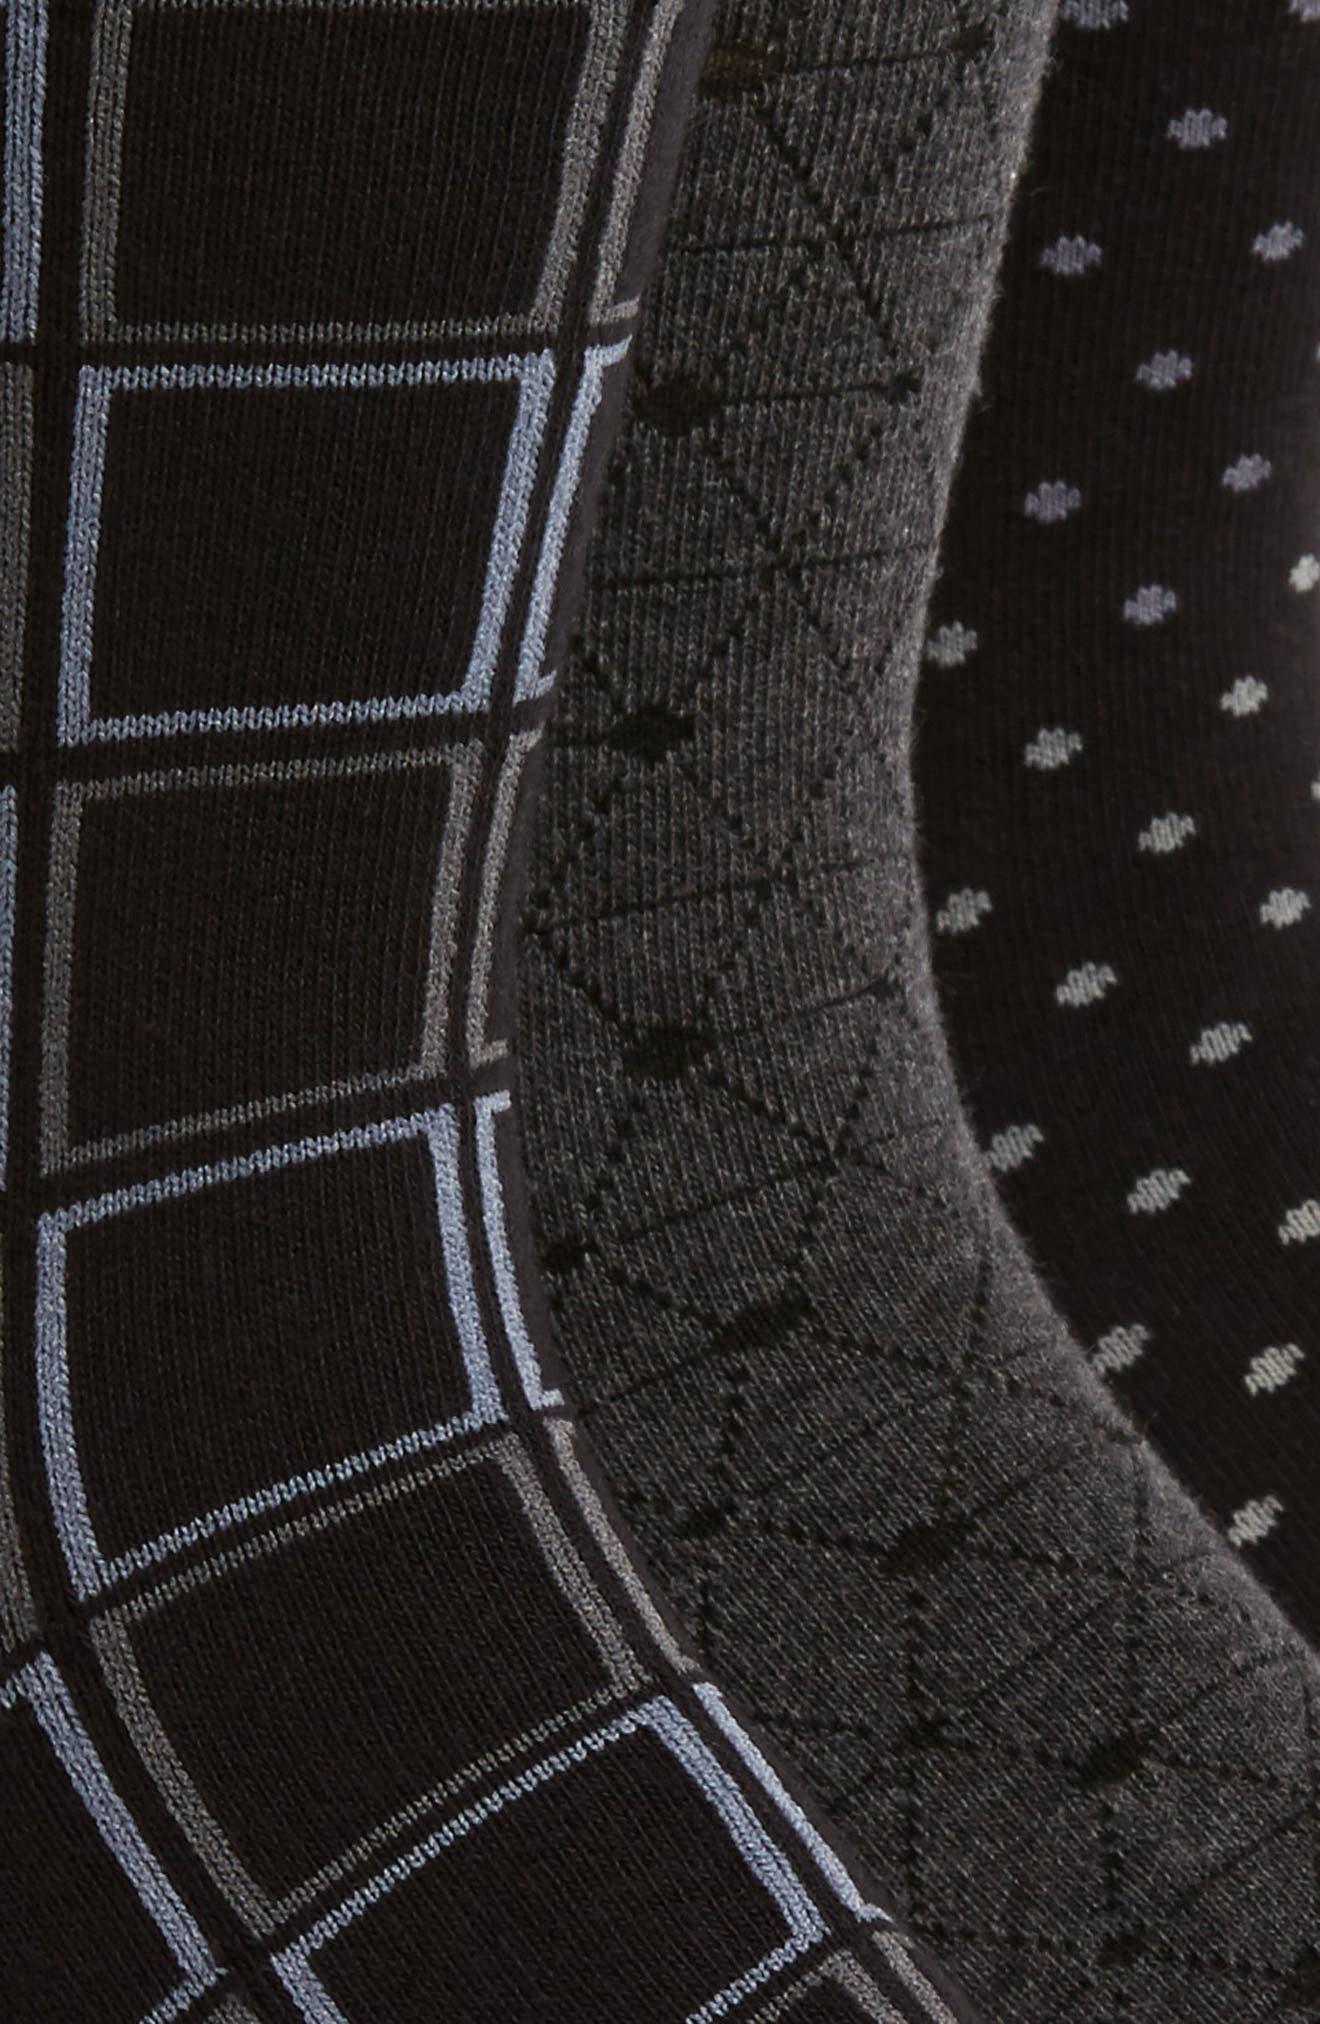 3-Pack Mixed Pattern Socks,                             Alternate thumbnail 2, color,                             021